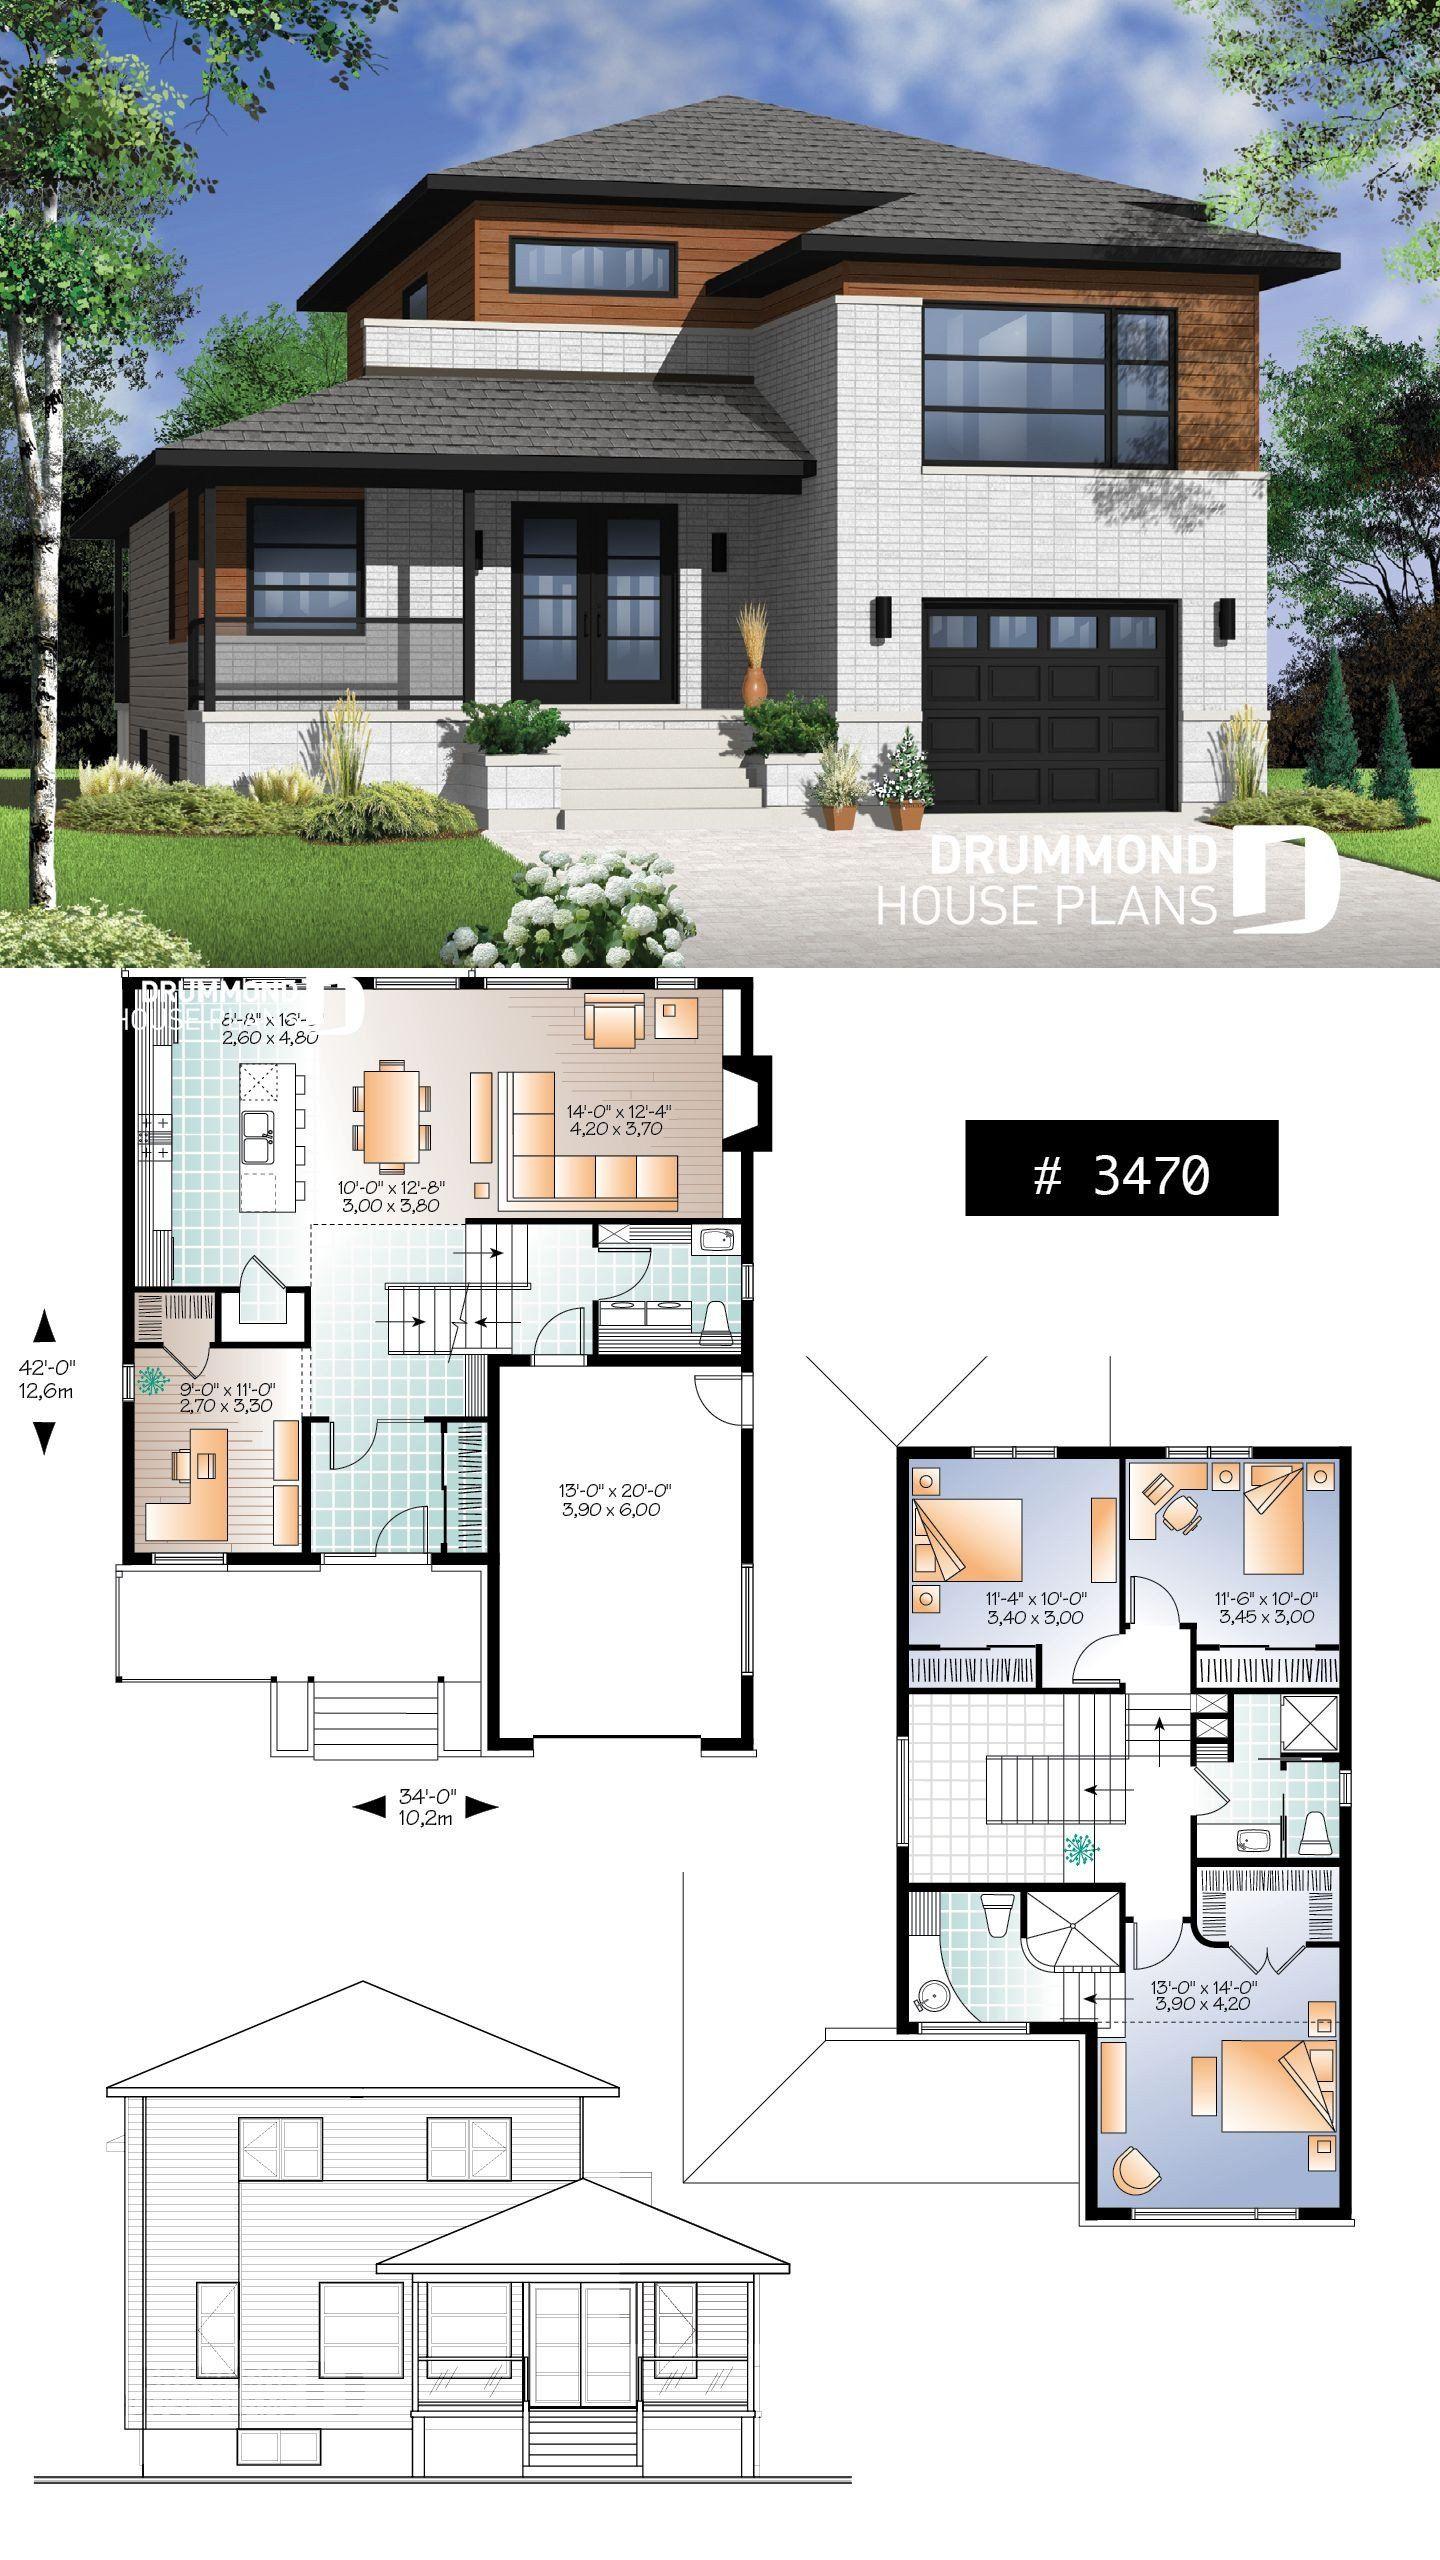 Modern House Designs Floor Plans House Plan Aldana No 3470 In 2020 House Blueprints Bungalow House Design New House Plans